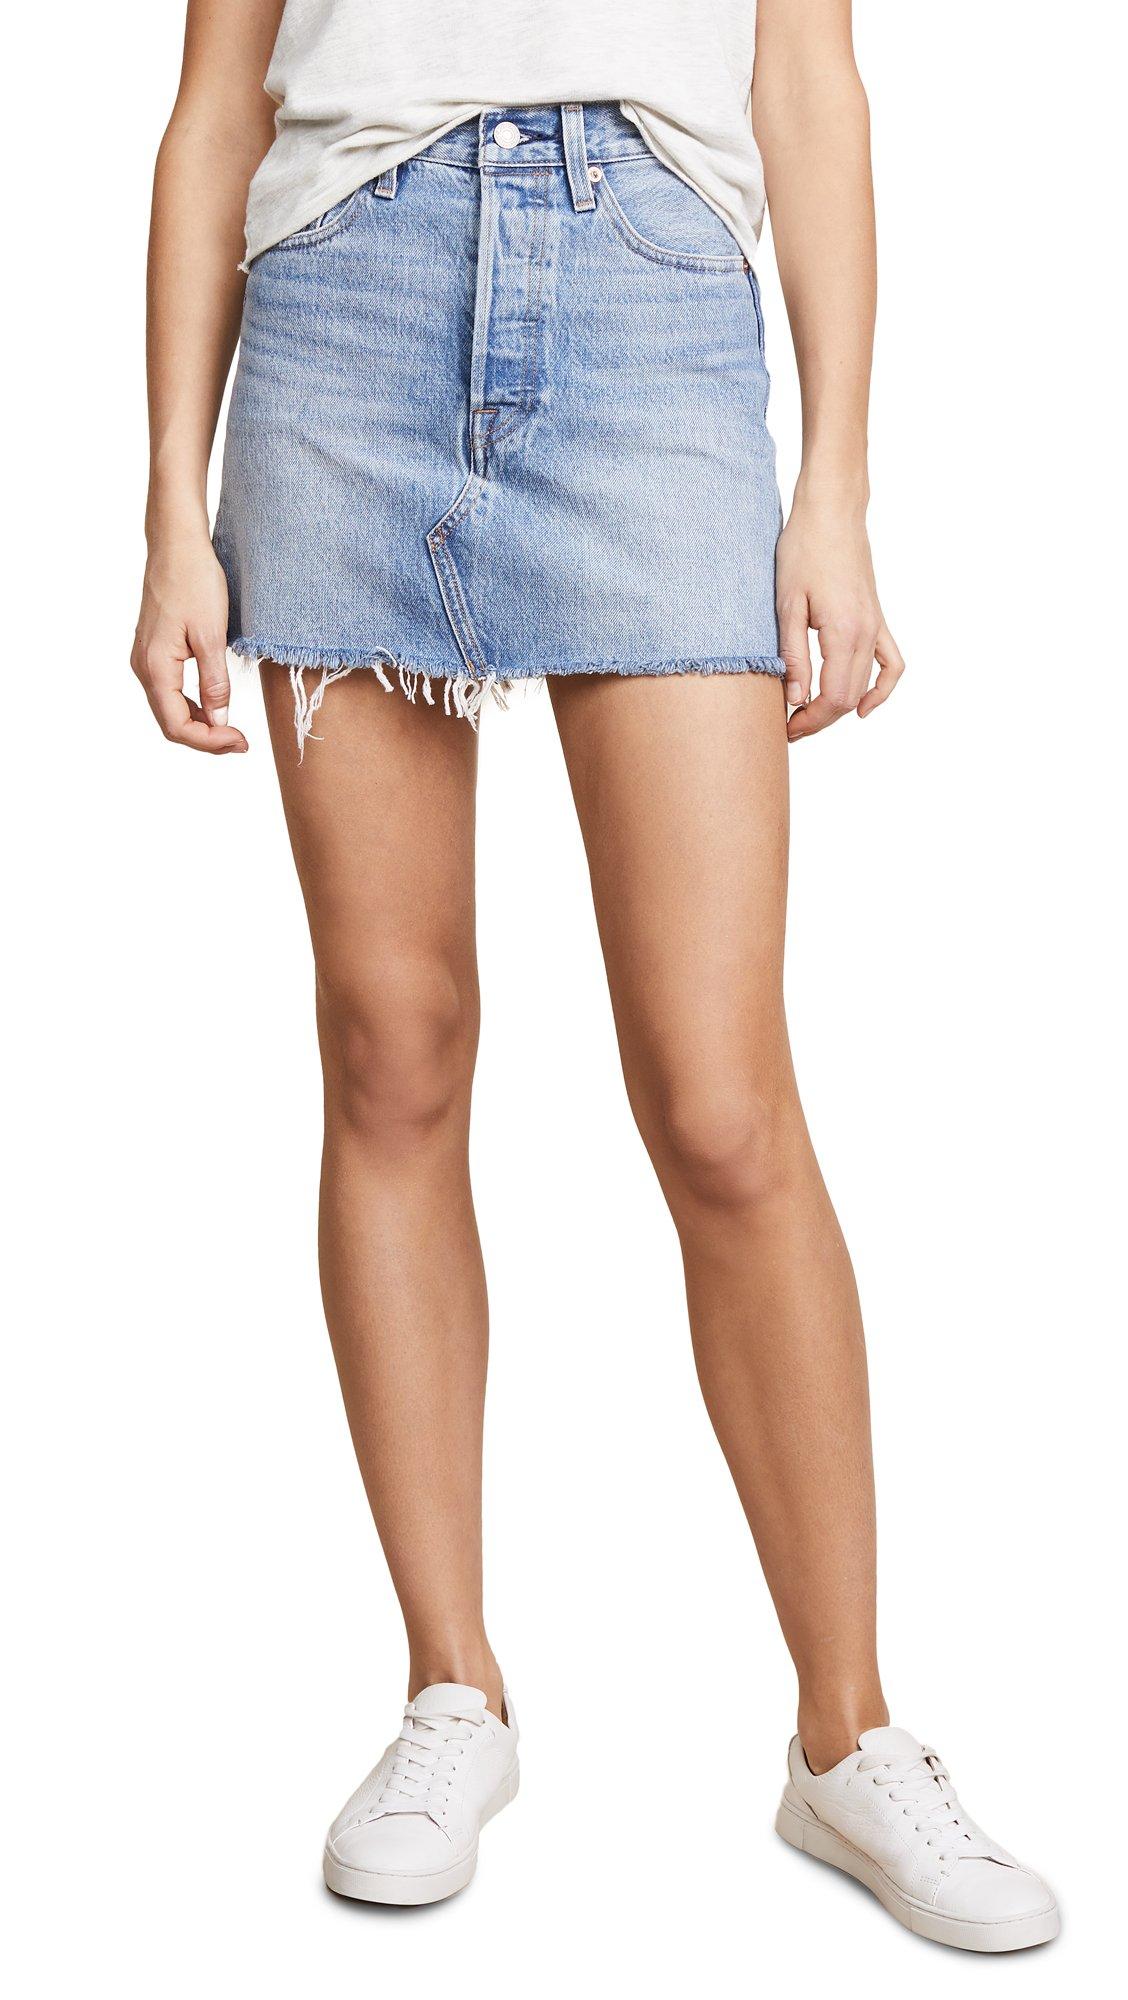 Levi's Women's Deconstructed Skirt, Desperate Measures, 29